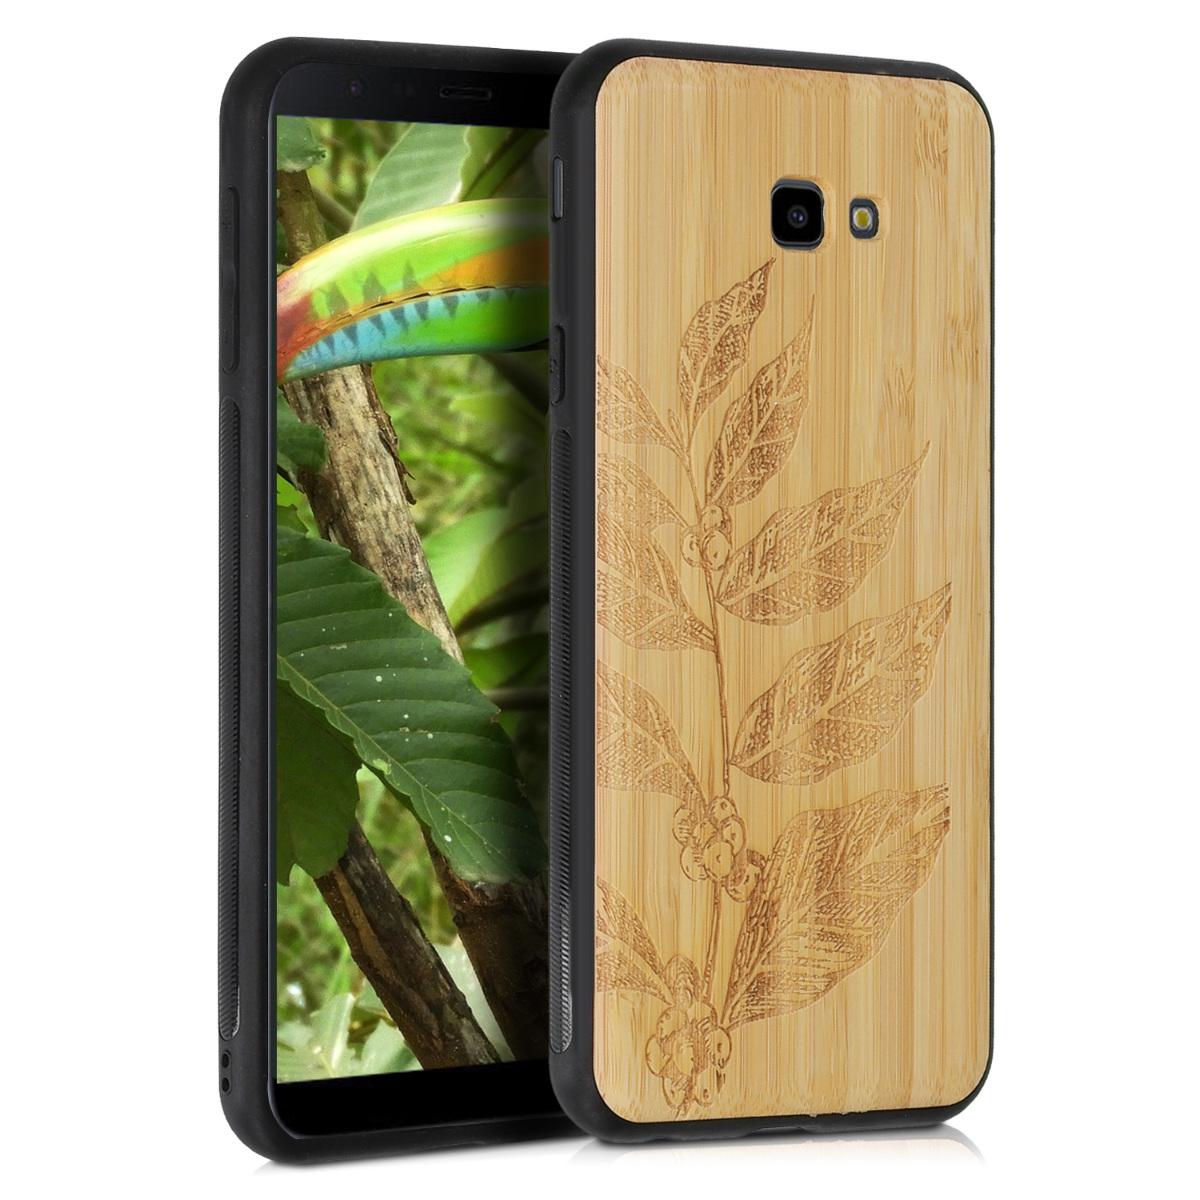 KW Σκληρή Ξύλινη Θήκη Samsung Galaxy J4+ / J4 Plus DUOS - Leaves and Berries bamboo - (47242.01)